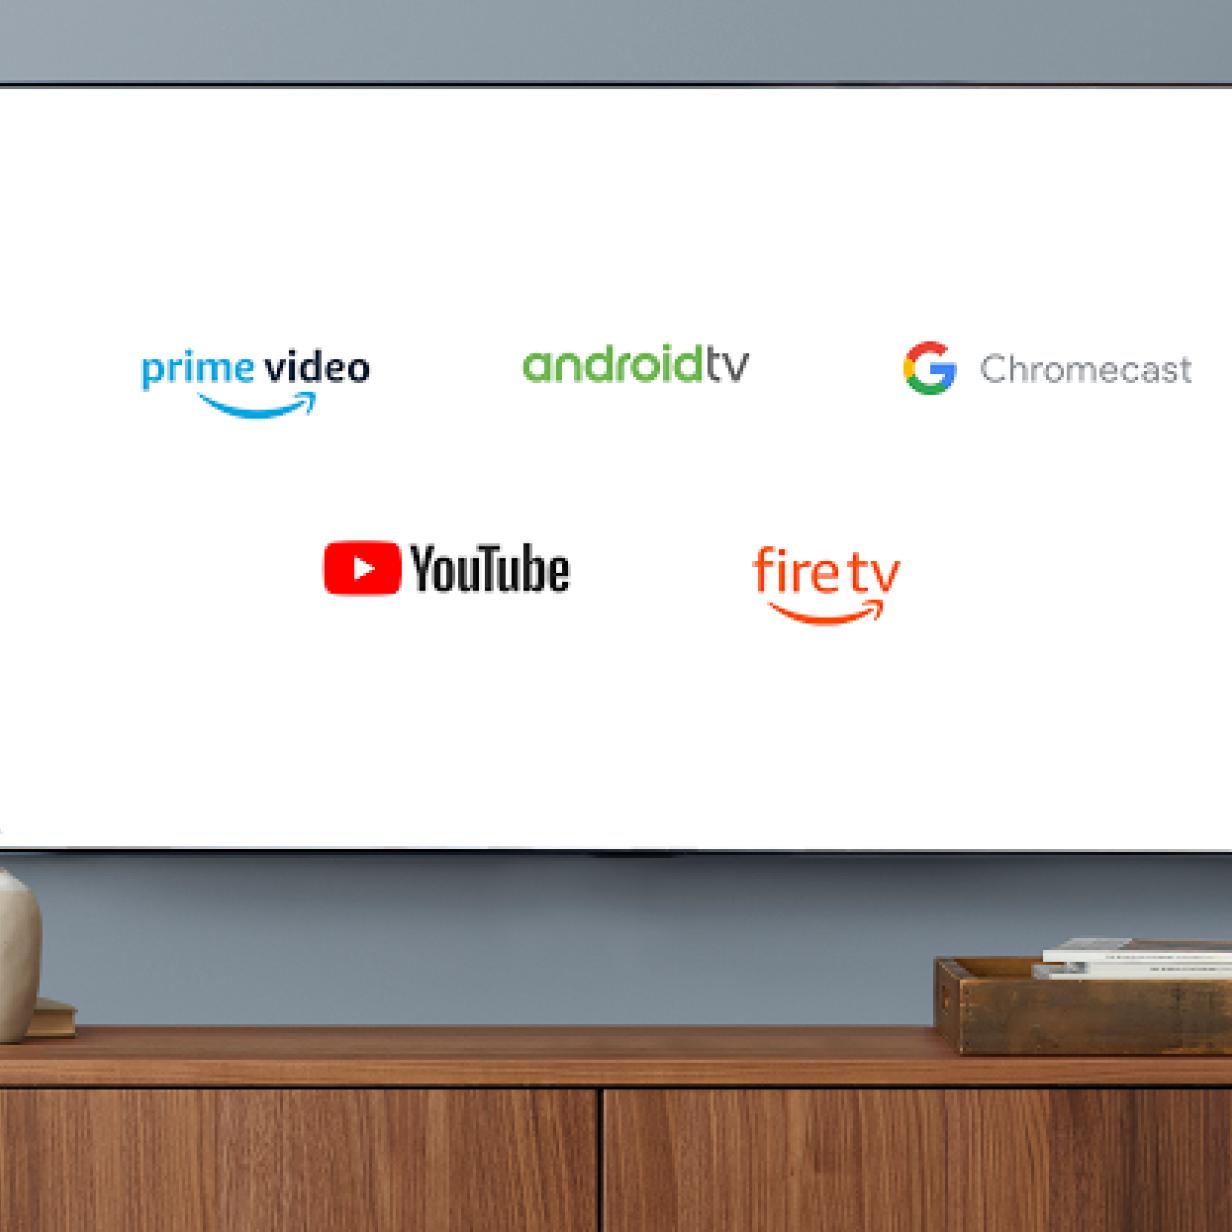 YouTube kehrt auf Fire TV zurück, Prime Video bekommt Chromecast